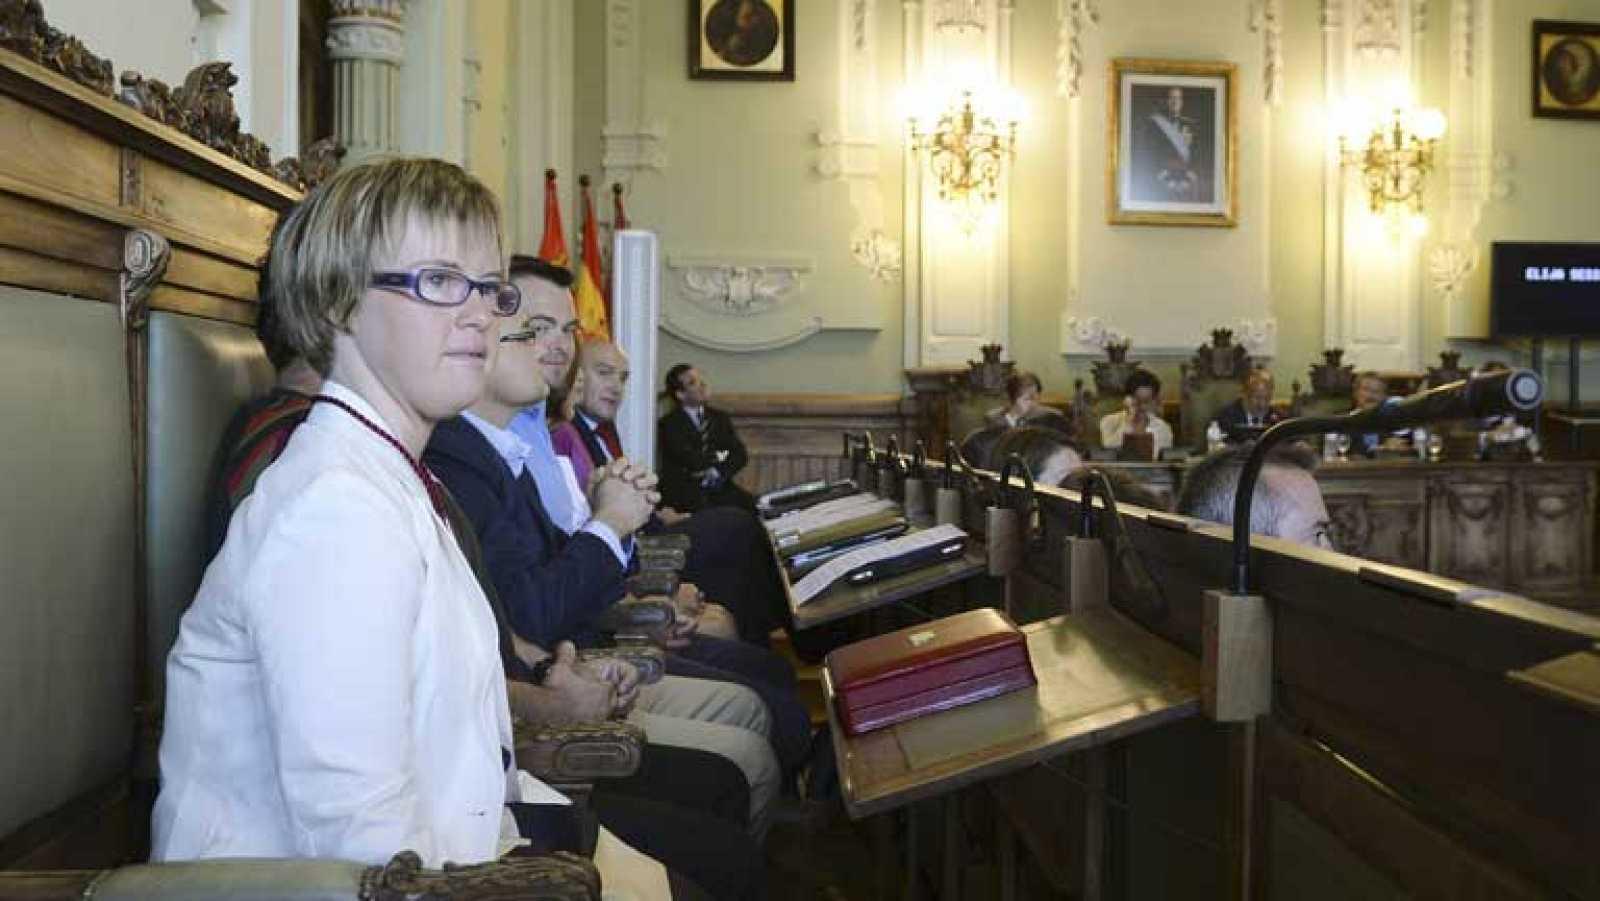 Ángela Bachiller, con síndrome de down, jura su cargo como concejala